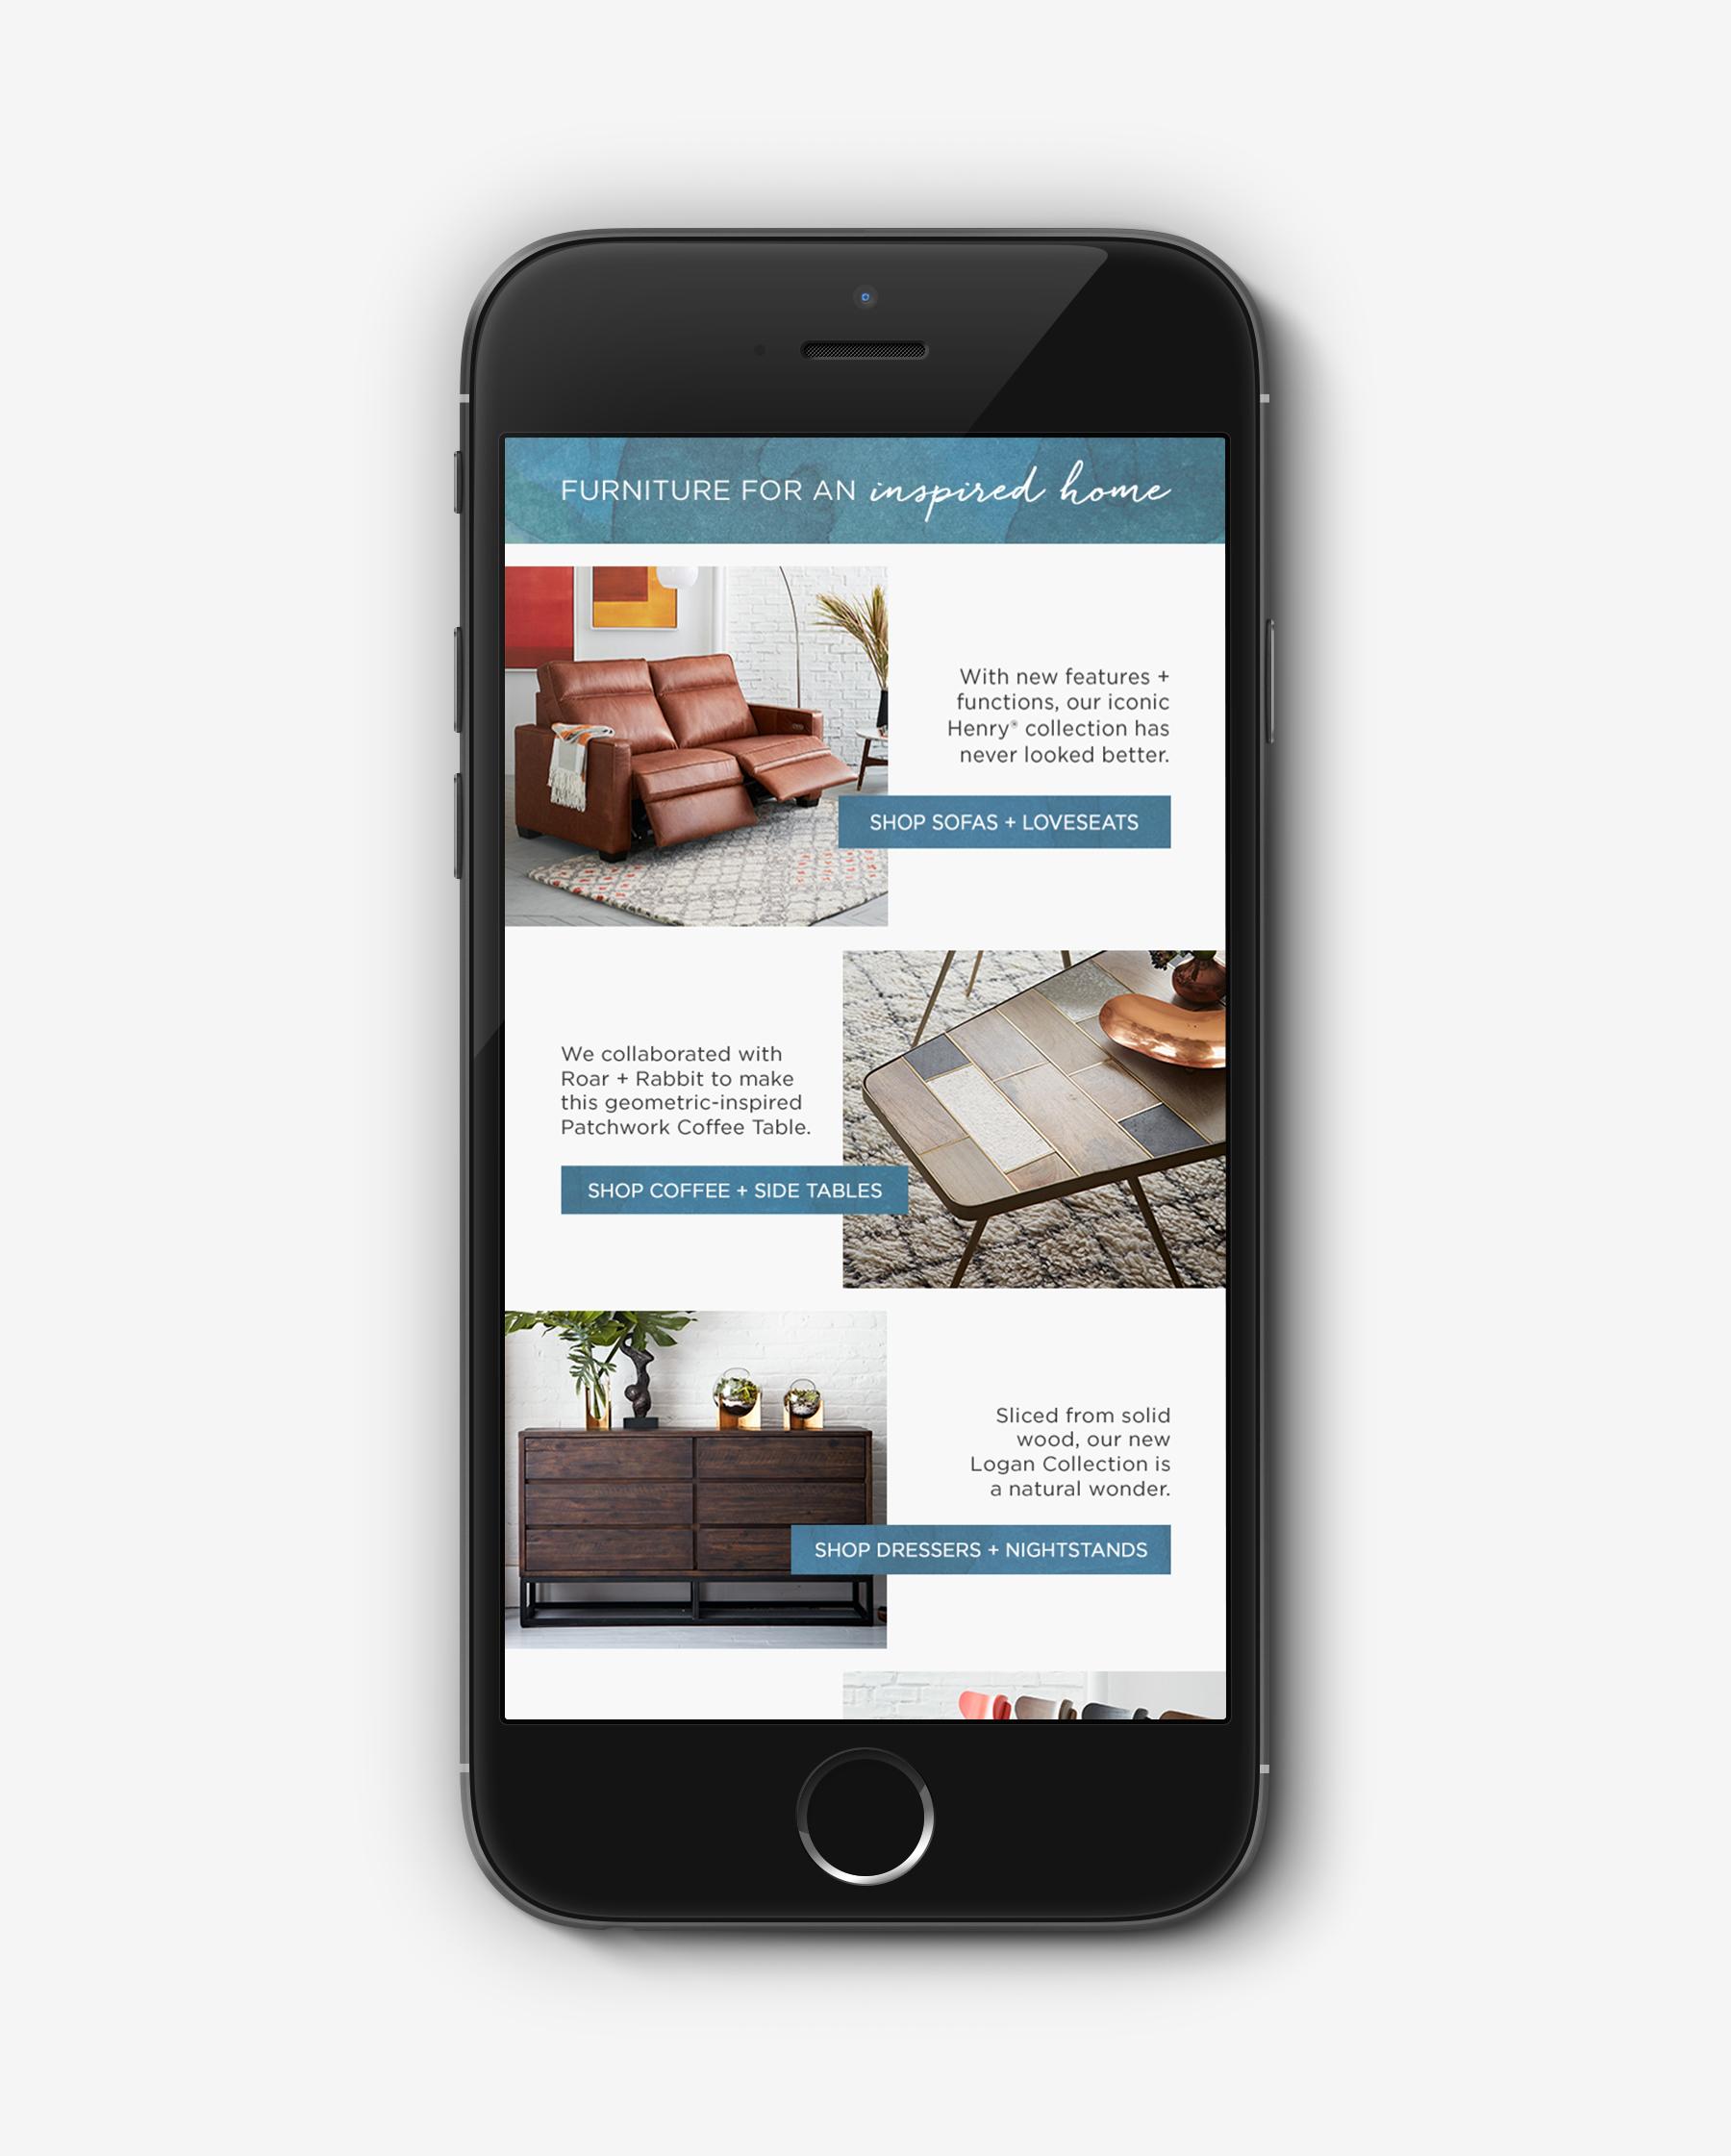 Furniture_Supercat_Mobile